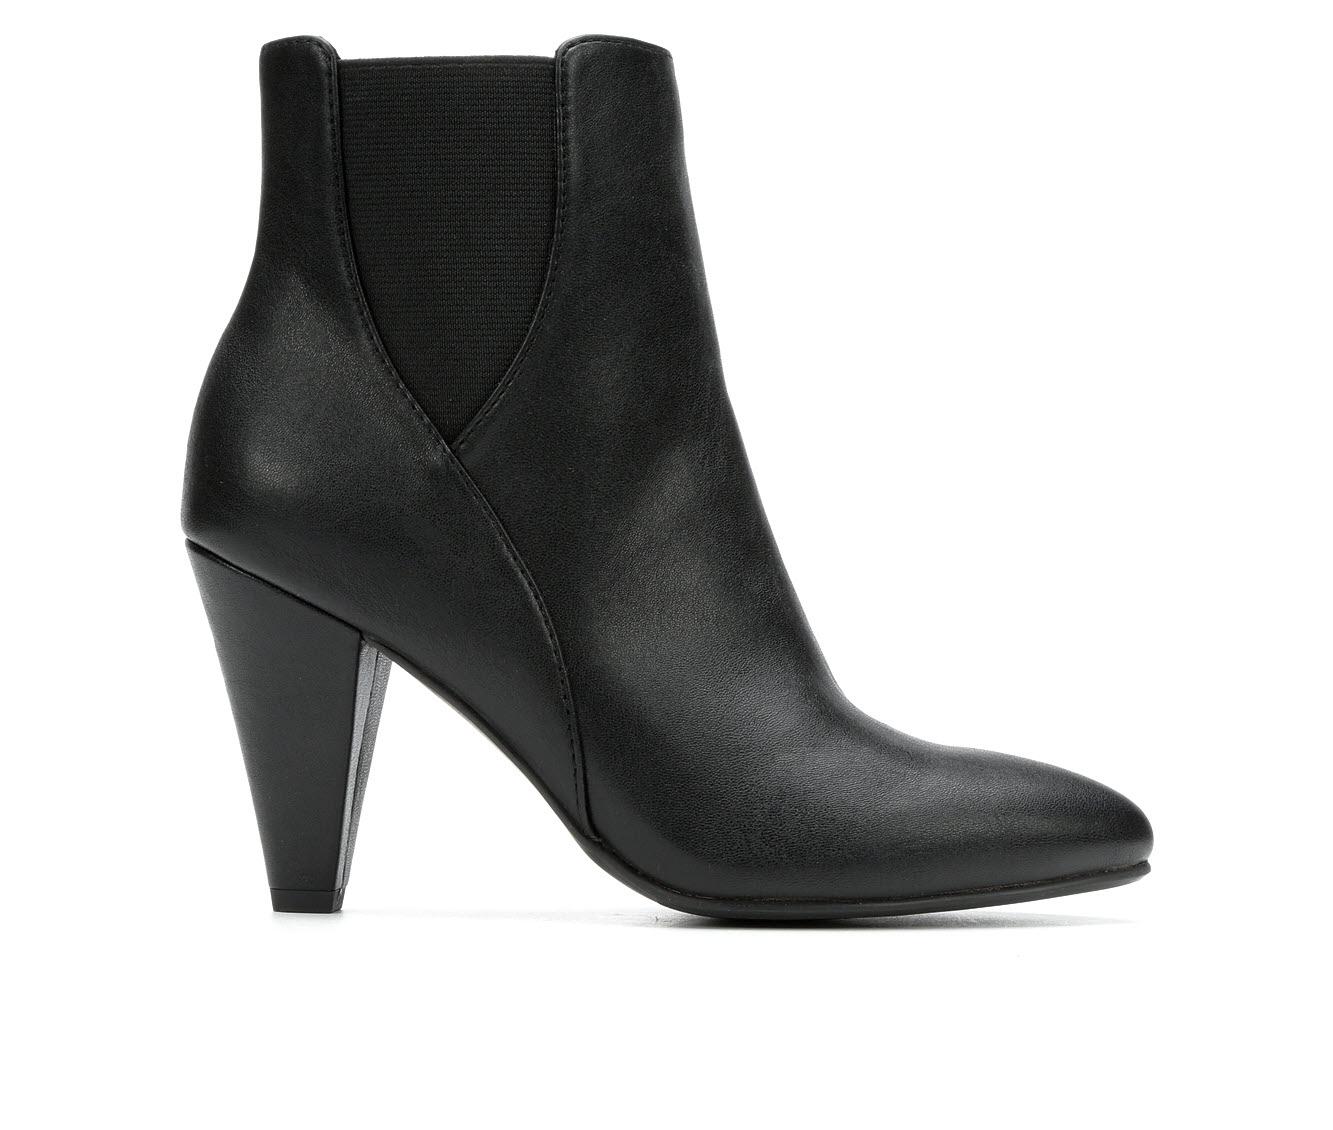 David Aaron Pharaoh Women's Boot (Black Faux Leather)